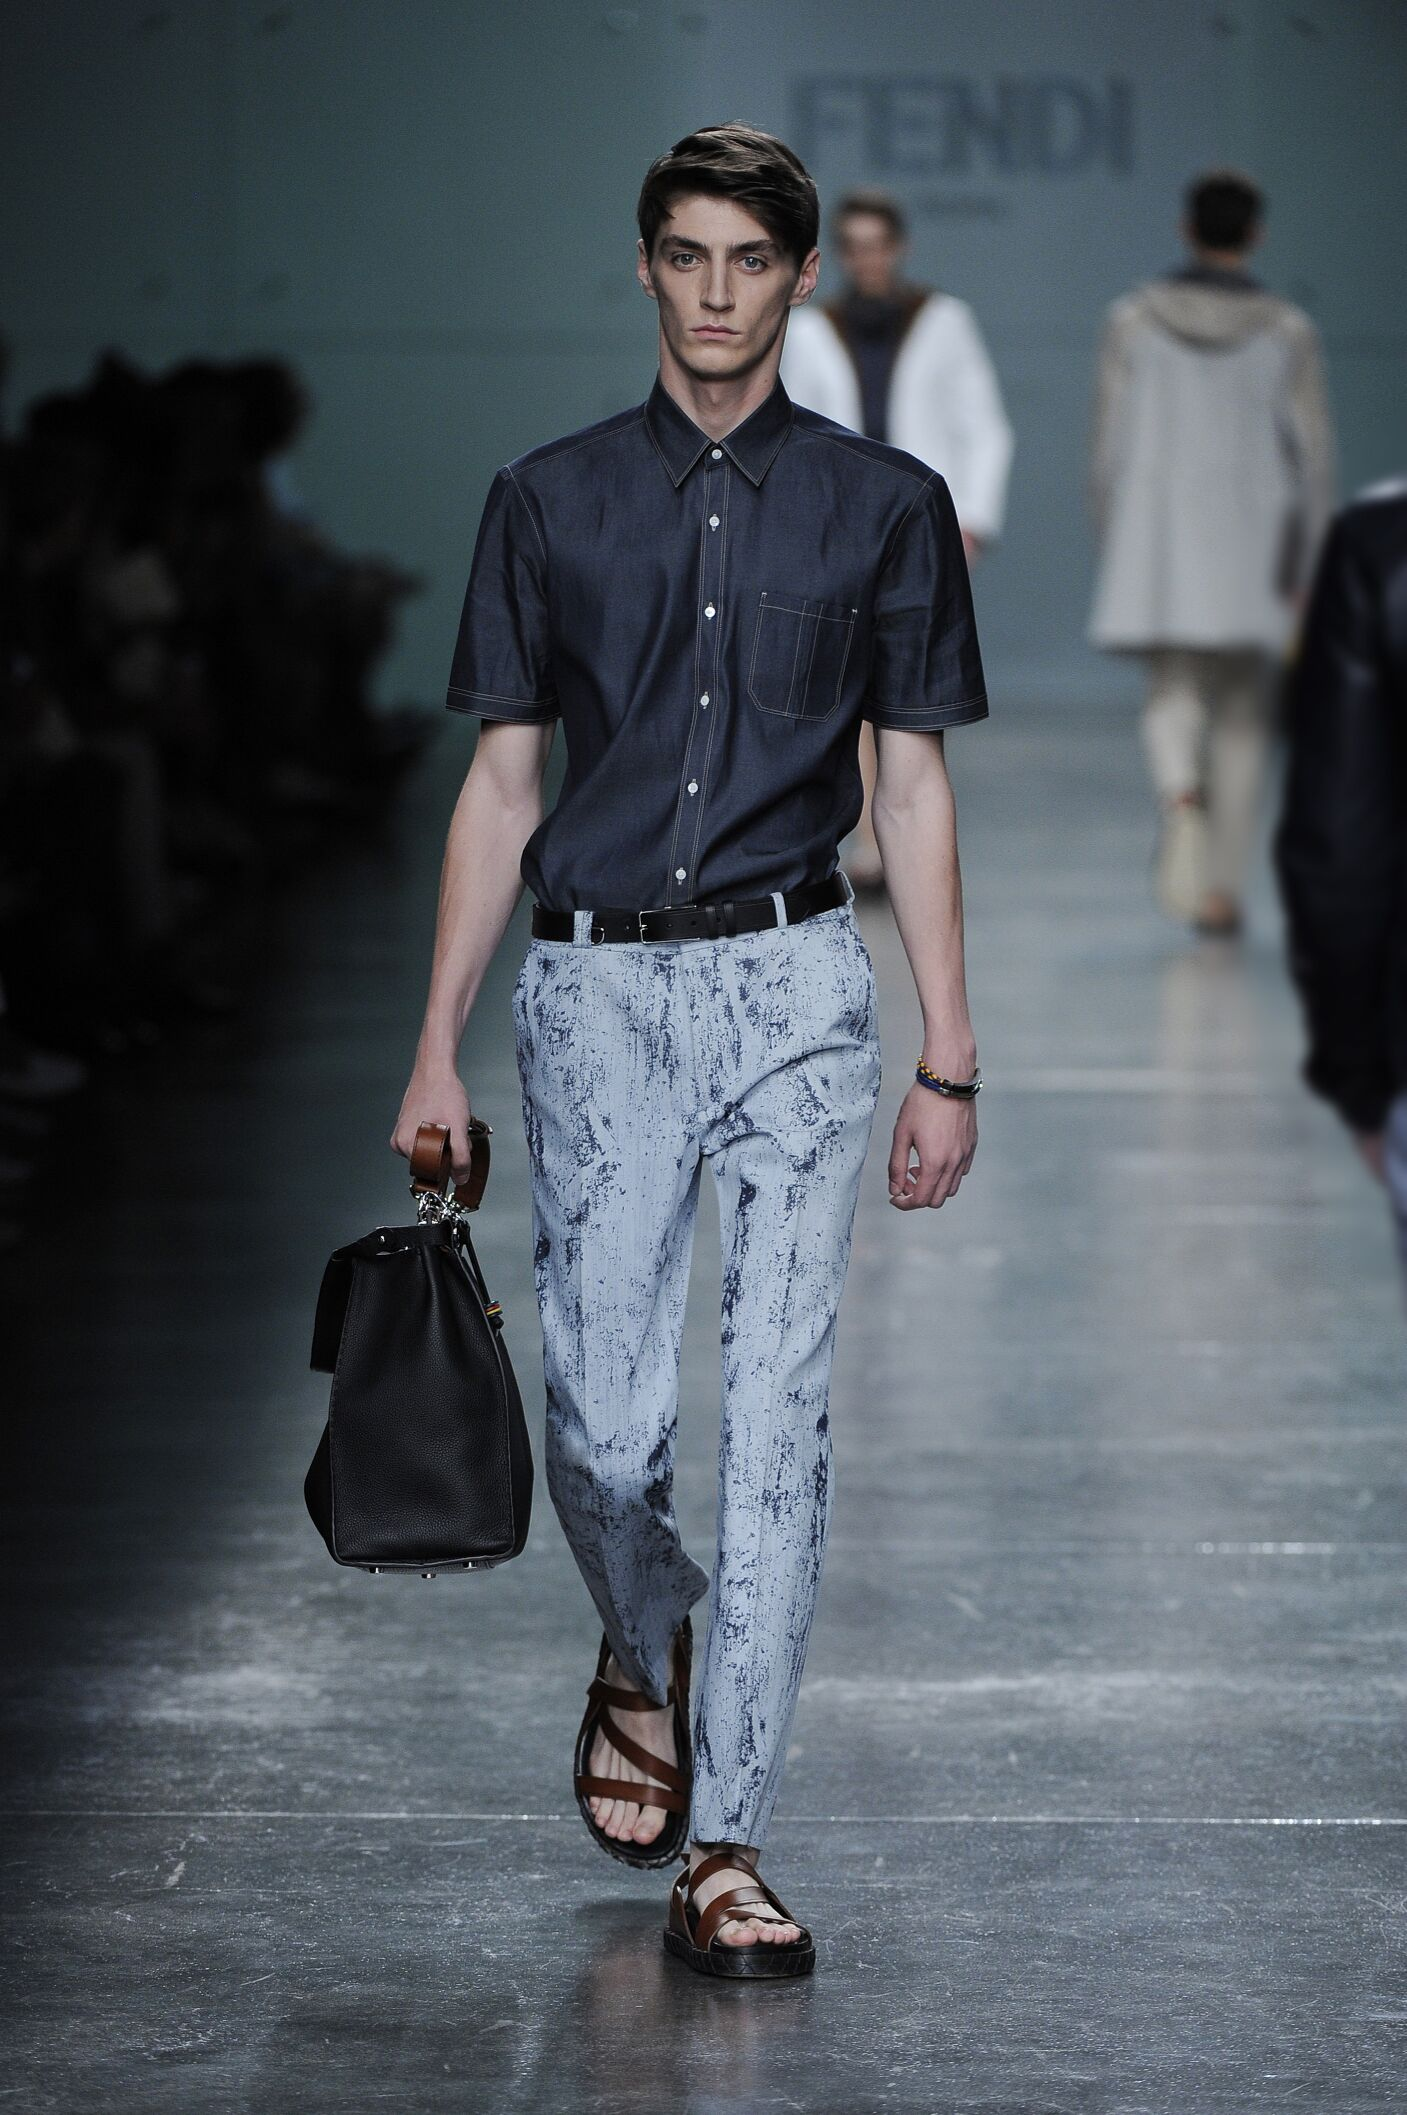 Catwalk Fendi Man Fashion Show Summer 2015